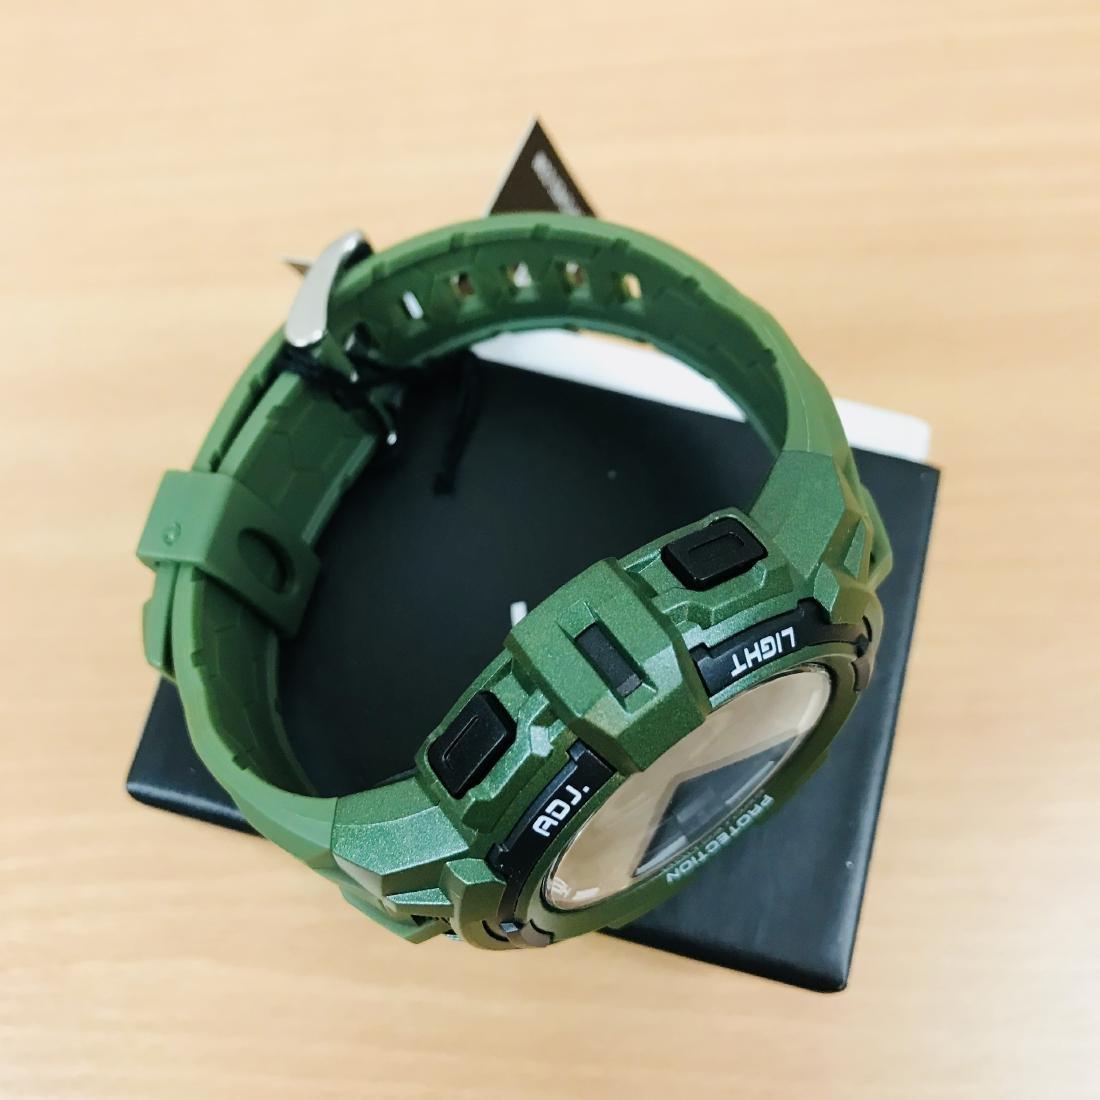 HEAD Super G Green Multifunctional Watch - 6